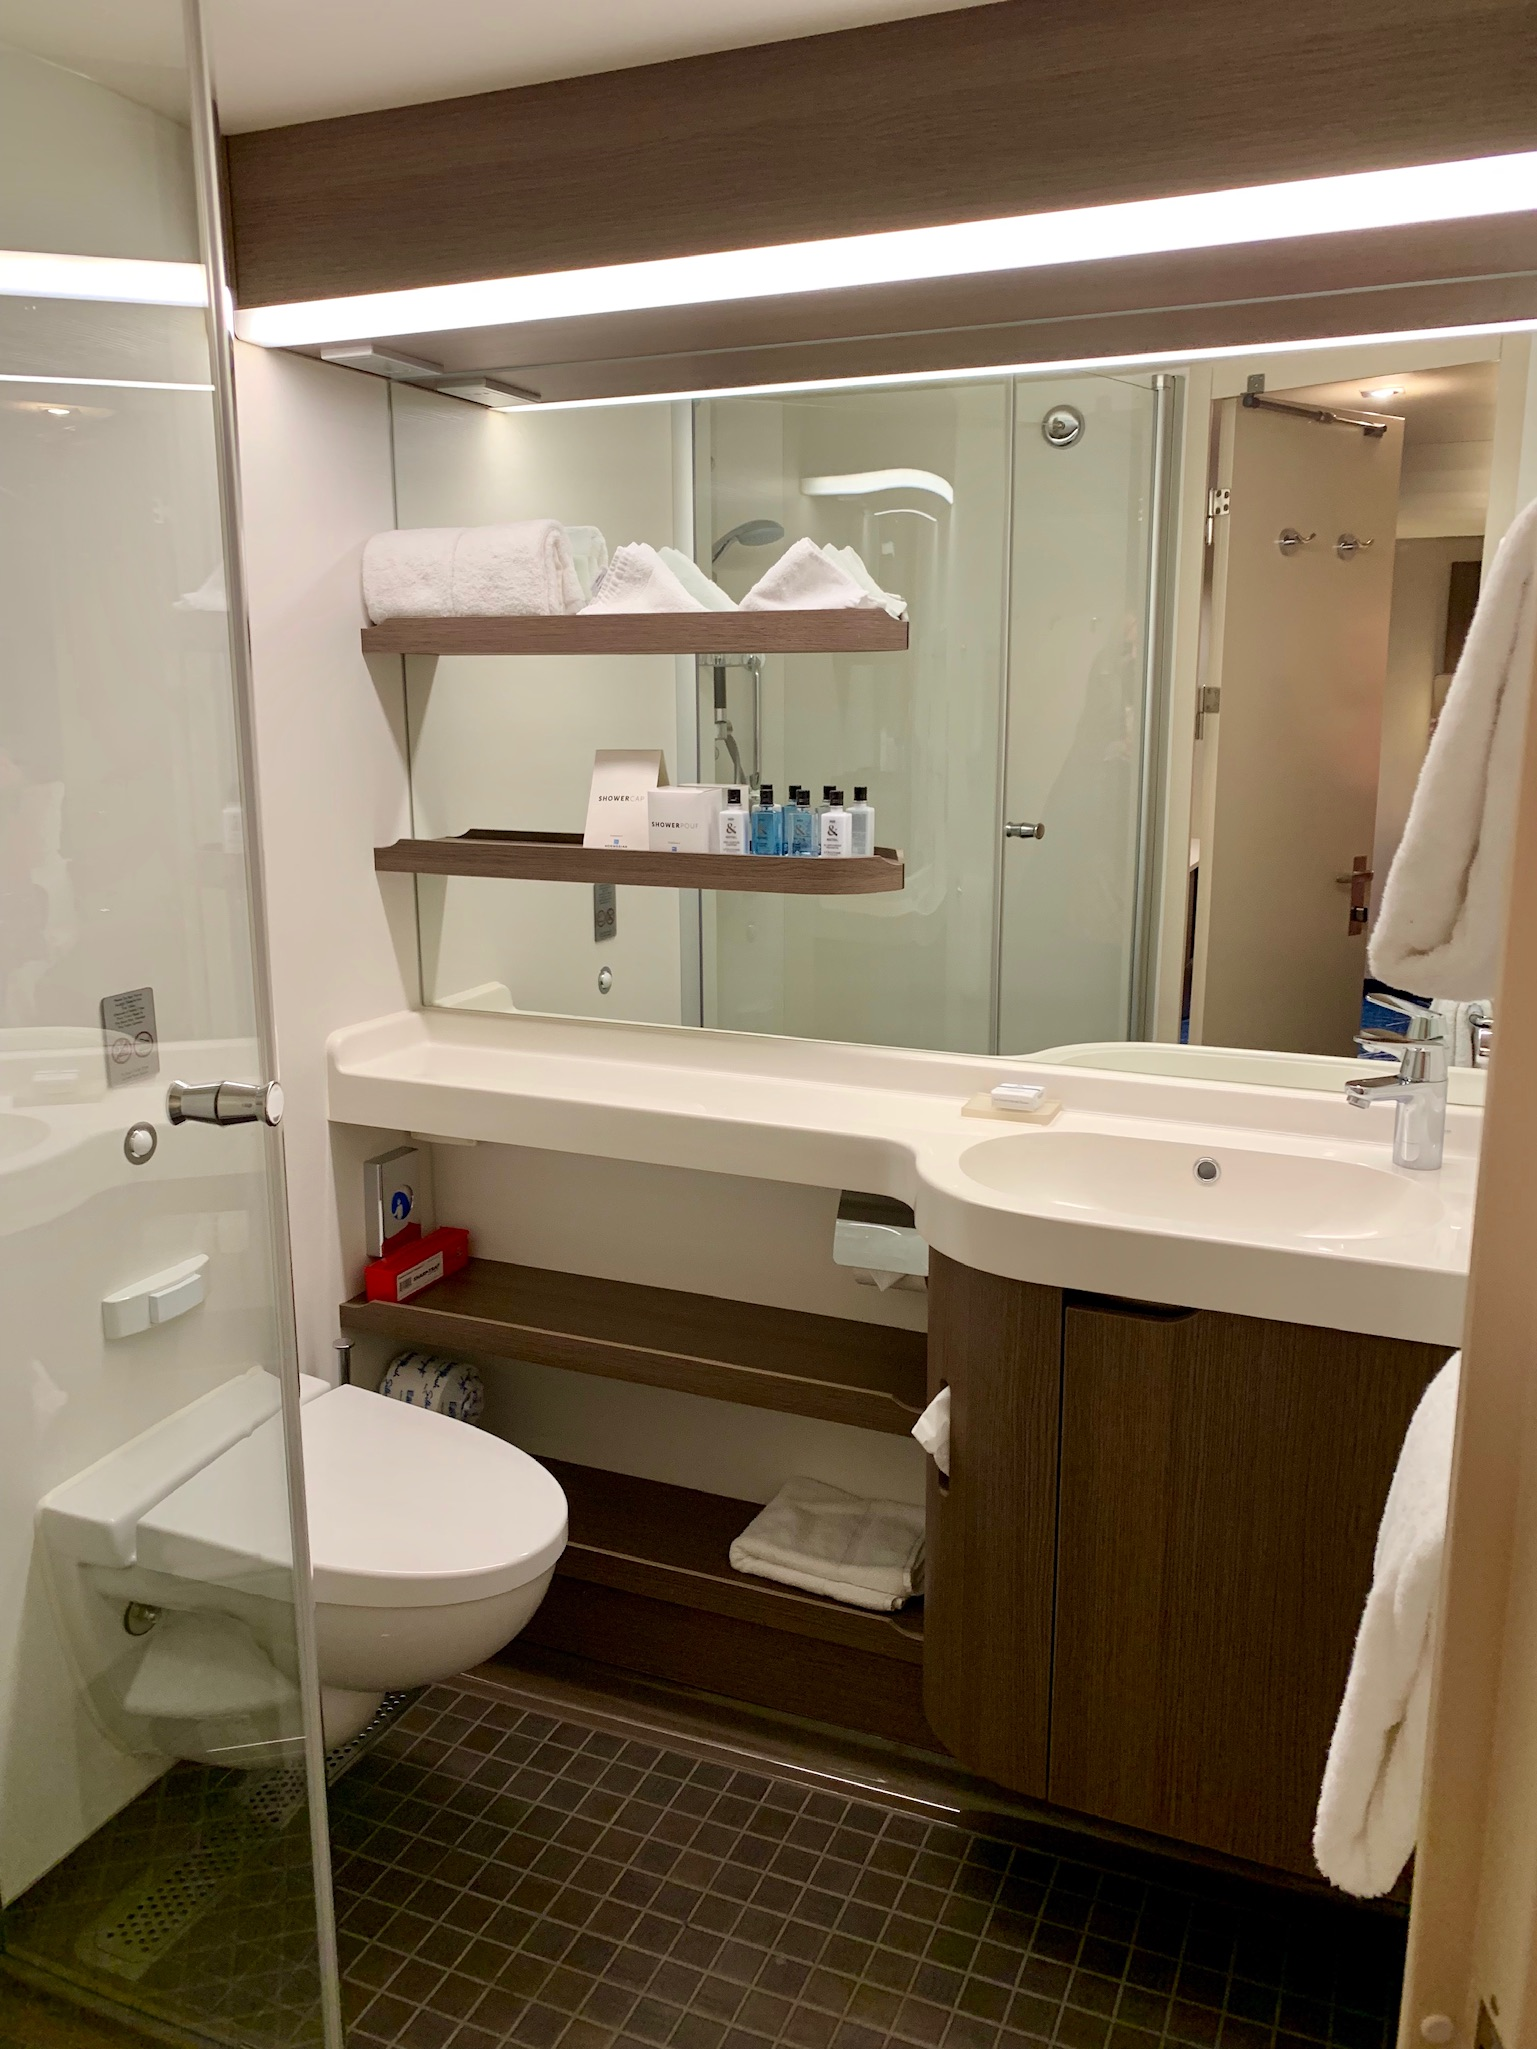 NCL Joy Room Concierge Family Inside Second Bedroom Bath Full.jpg